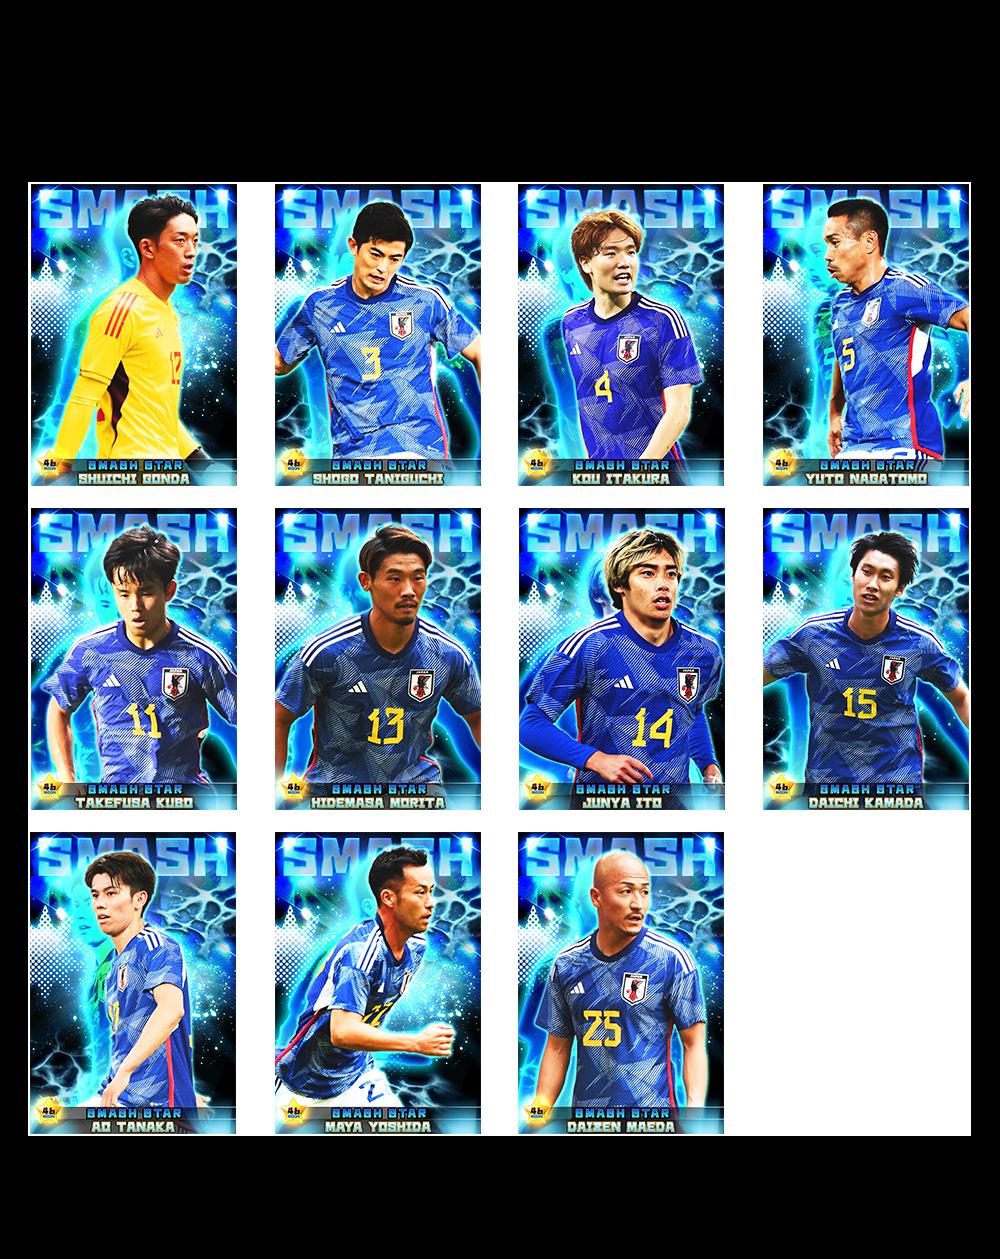 実名実写サッカー日本代表選手カード続々登場!